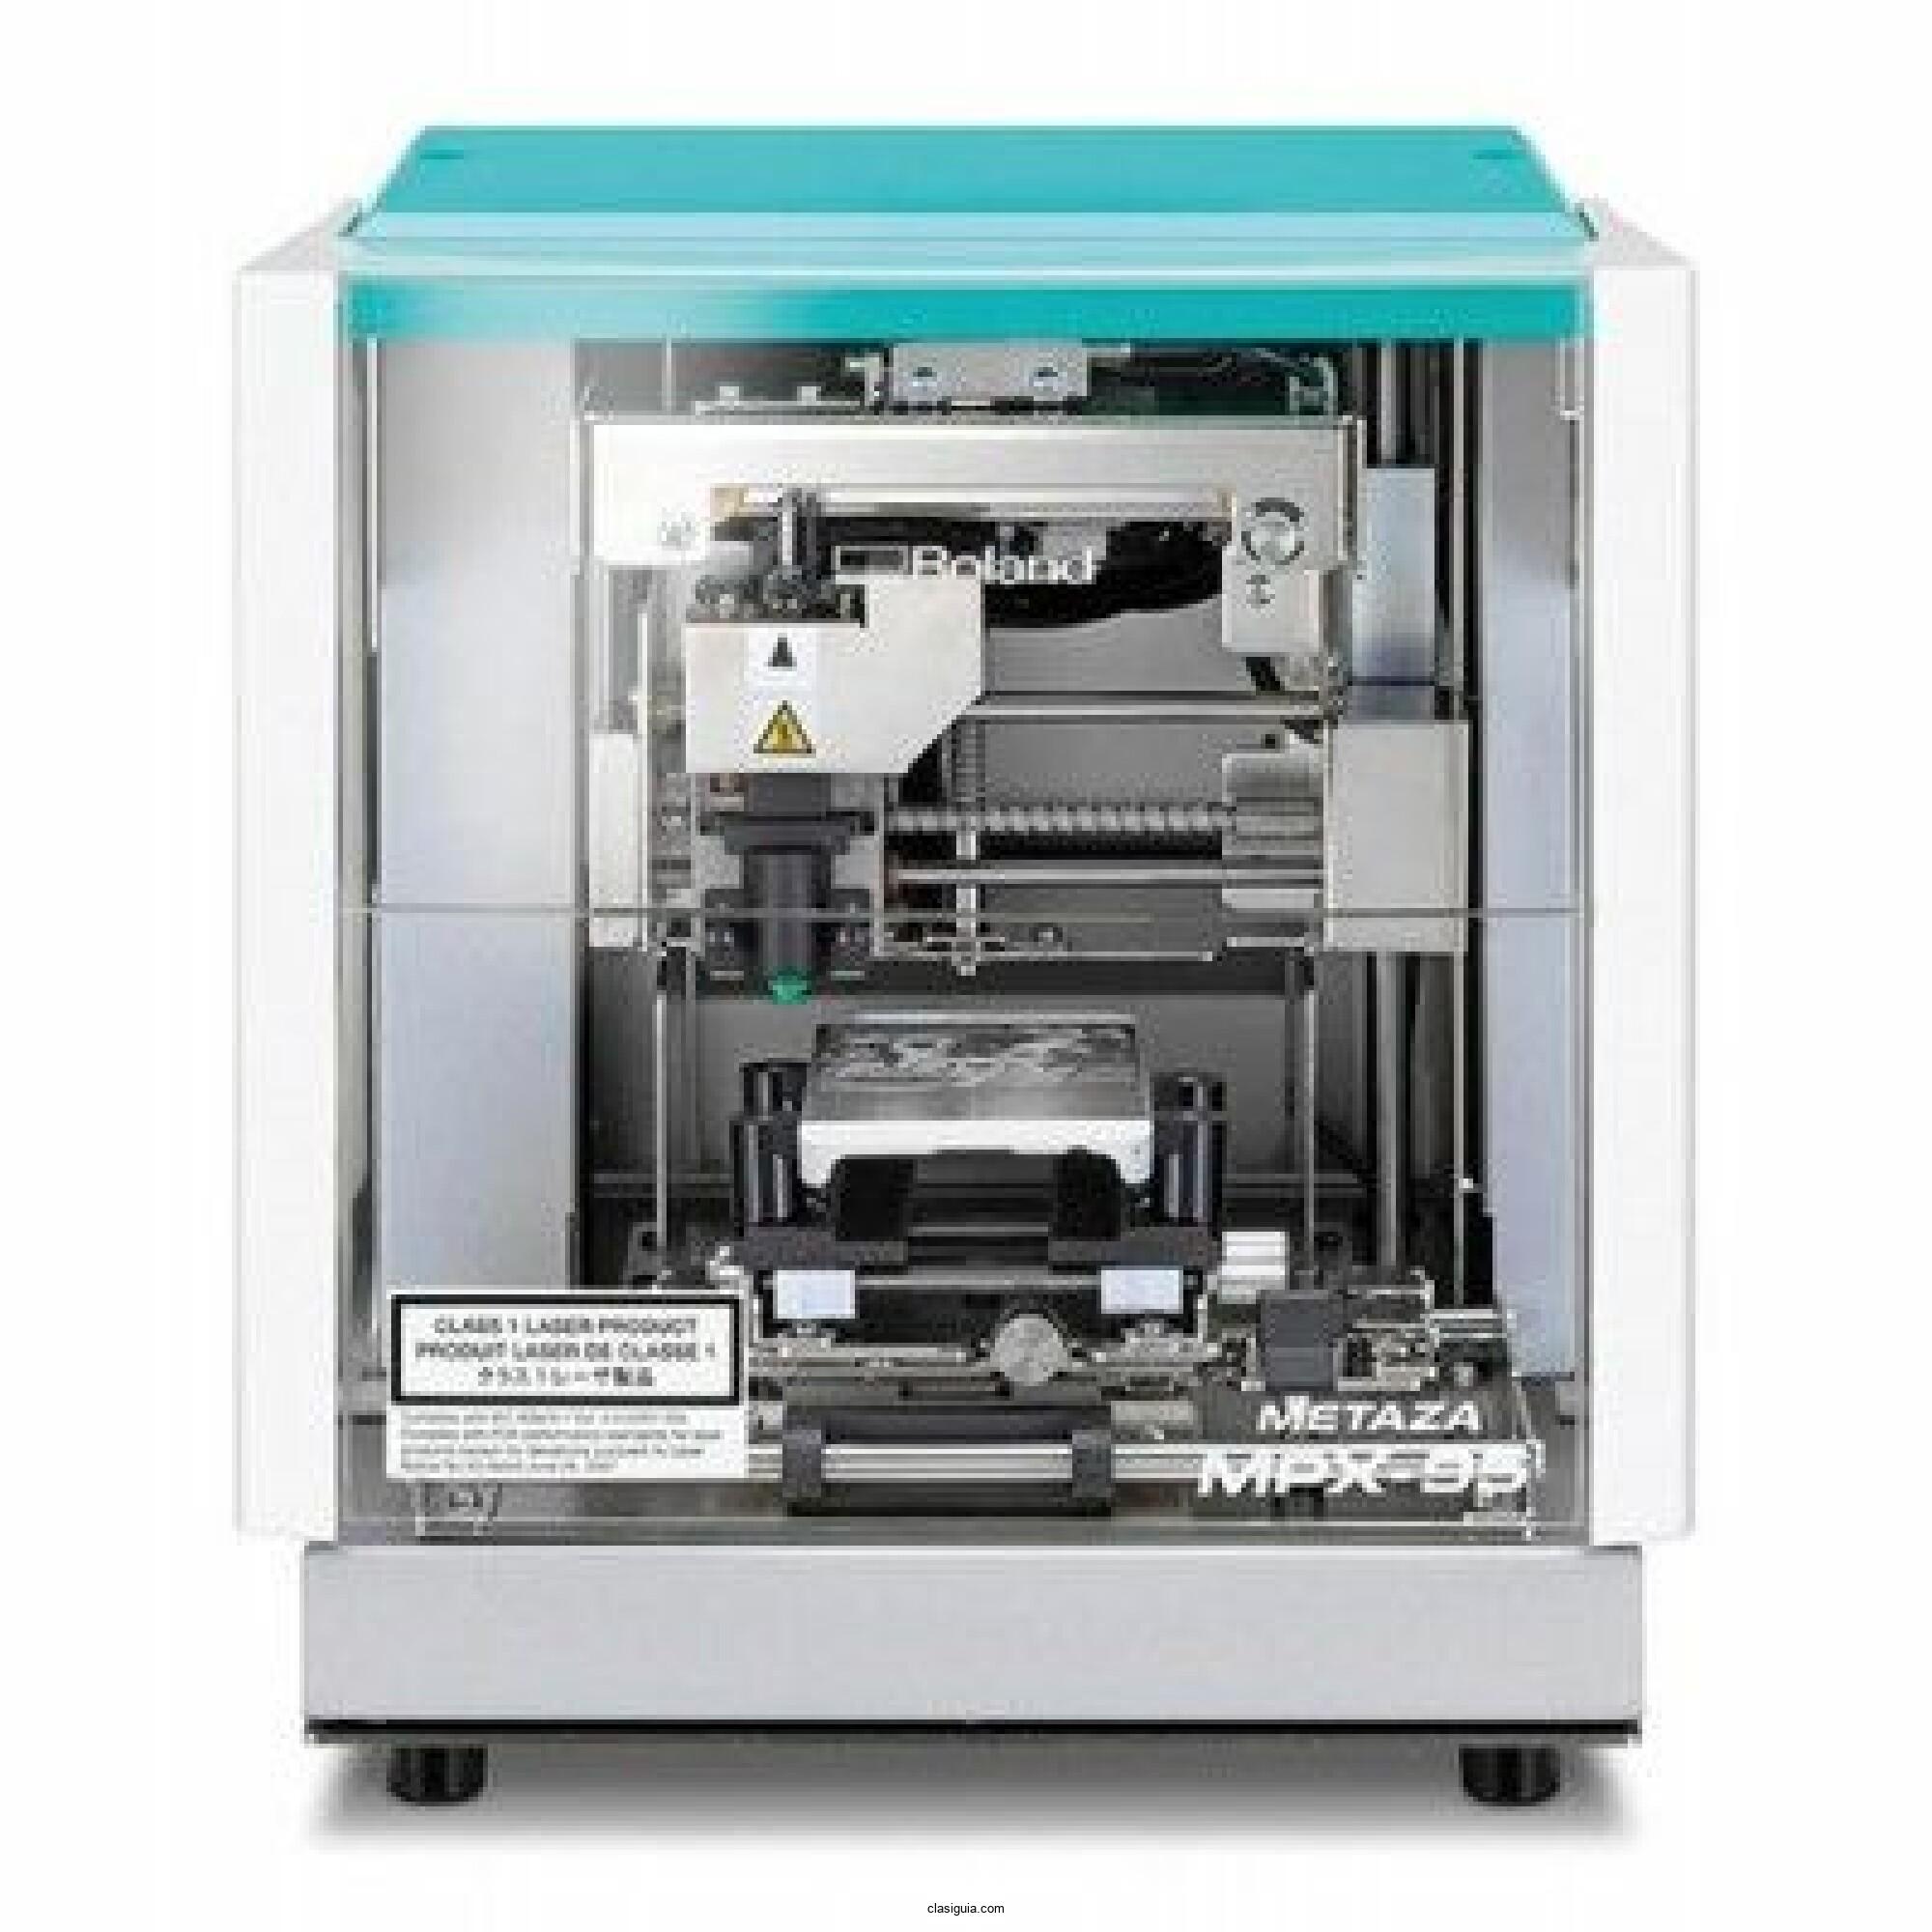 Roland Metaza MPX-95 Photo Impact Printer with Gift Kit (MITRA PRINT)